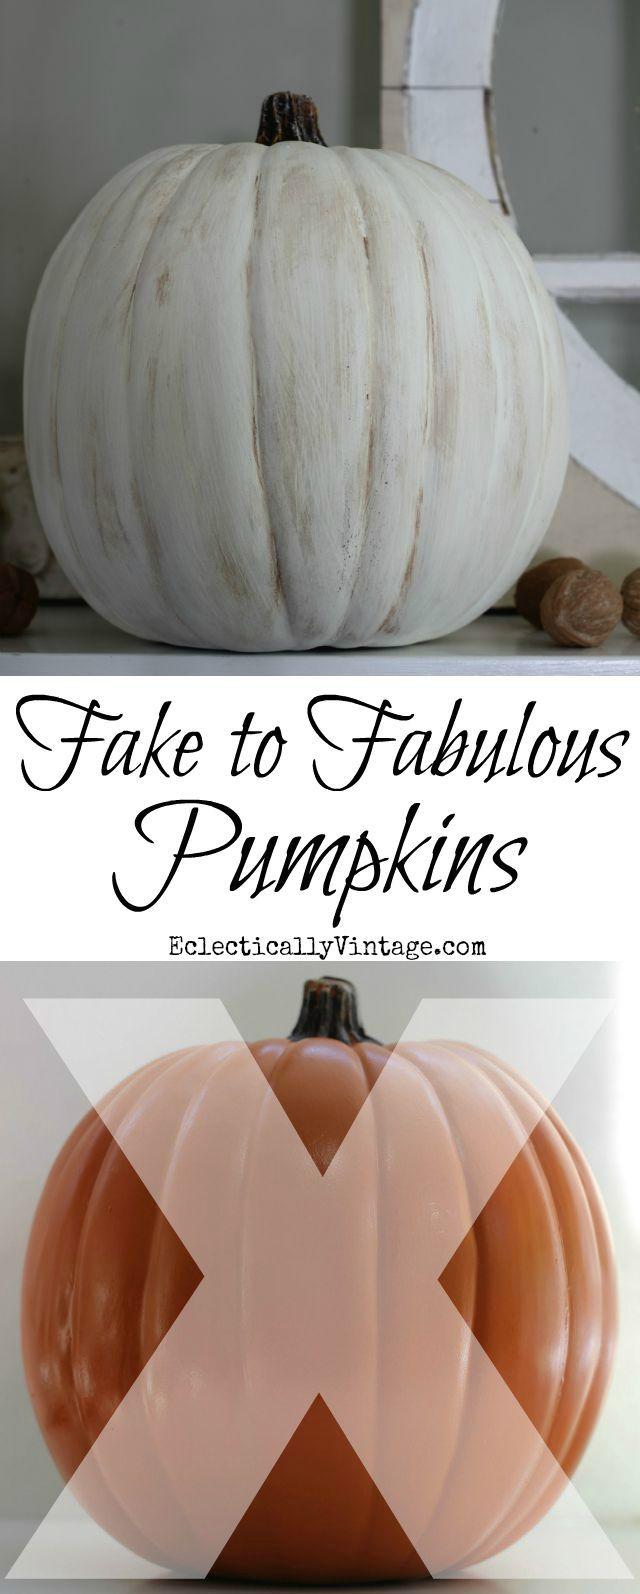 Best 25+ Plastic pumpkins ideas on Pinterest | Fake pumpkins ...